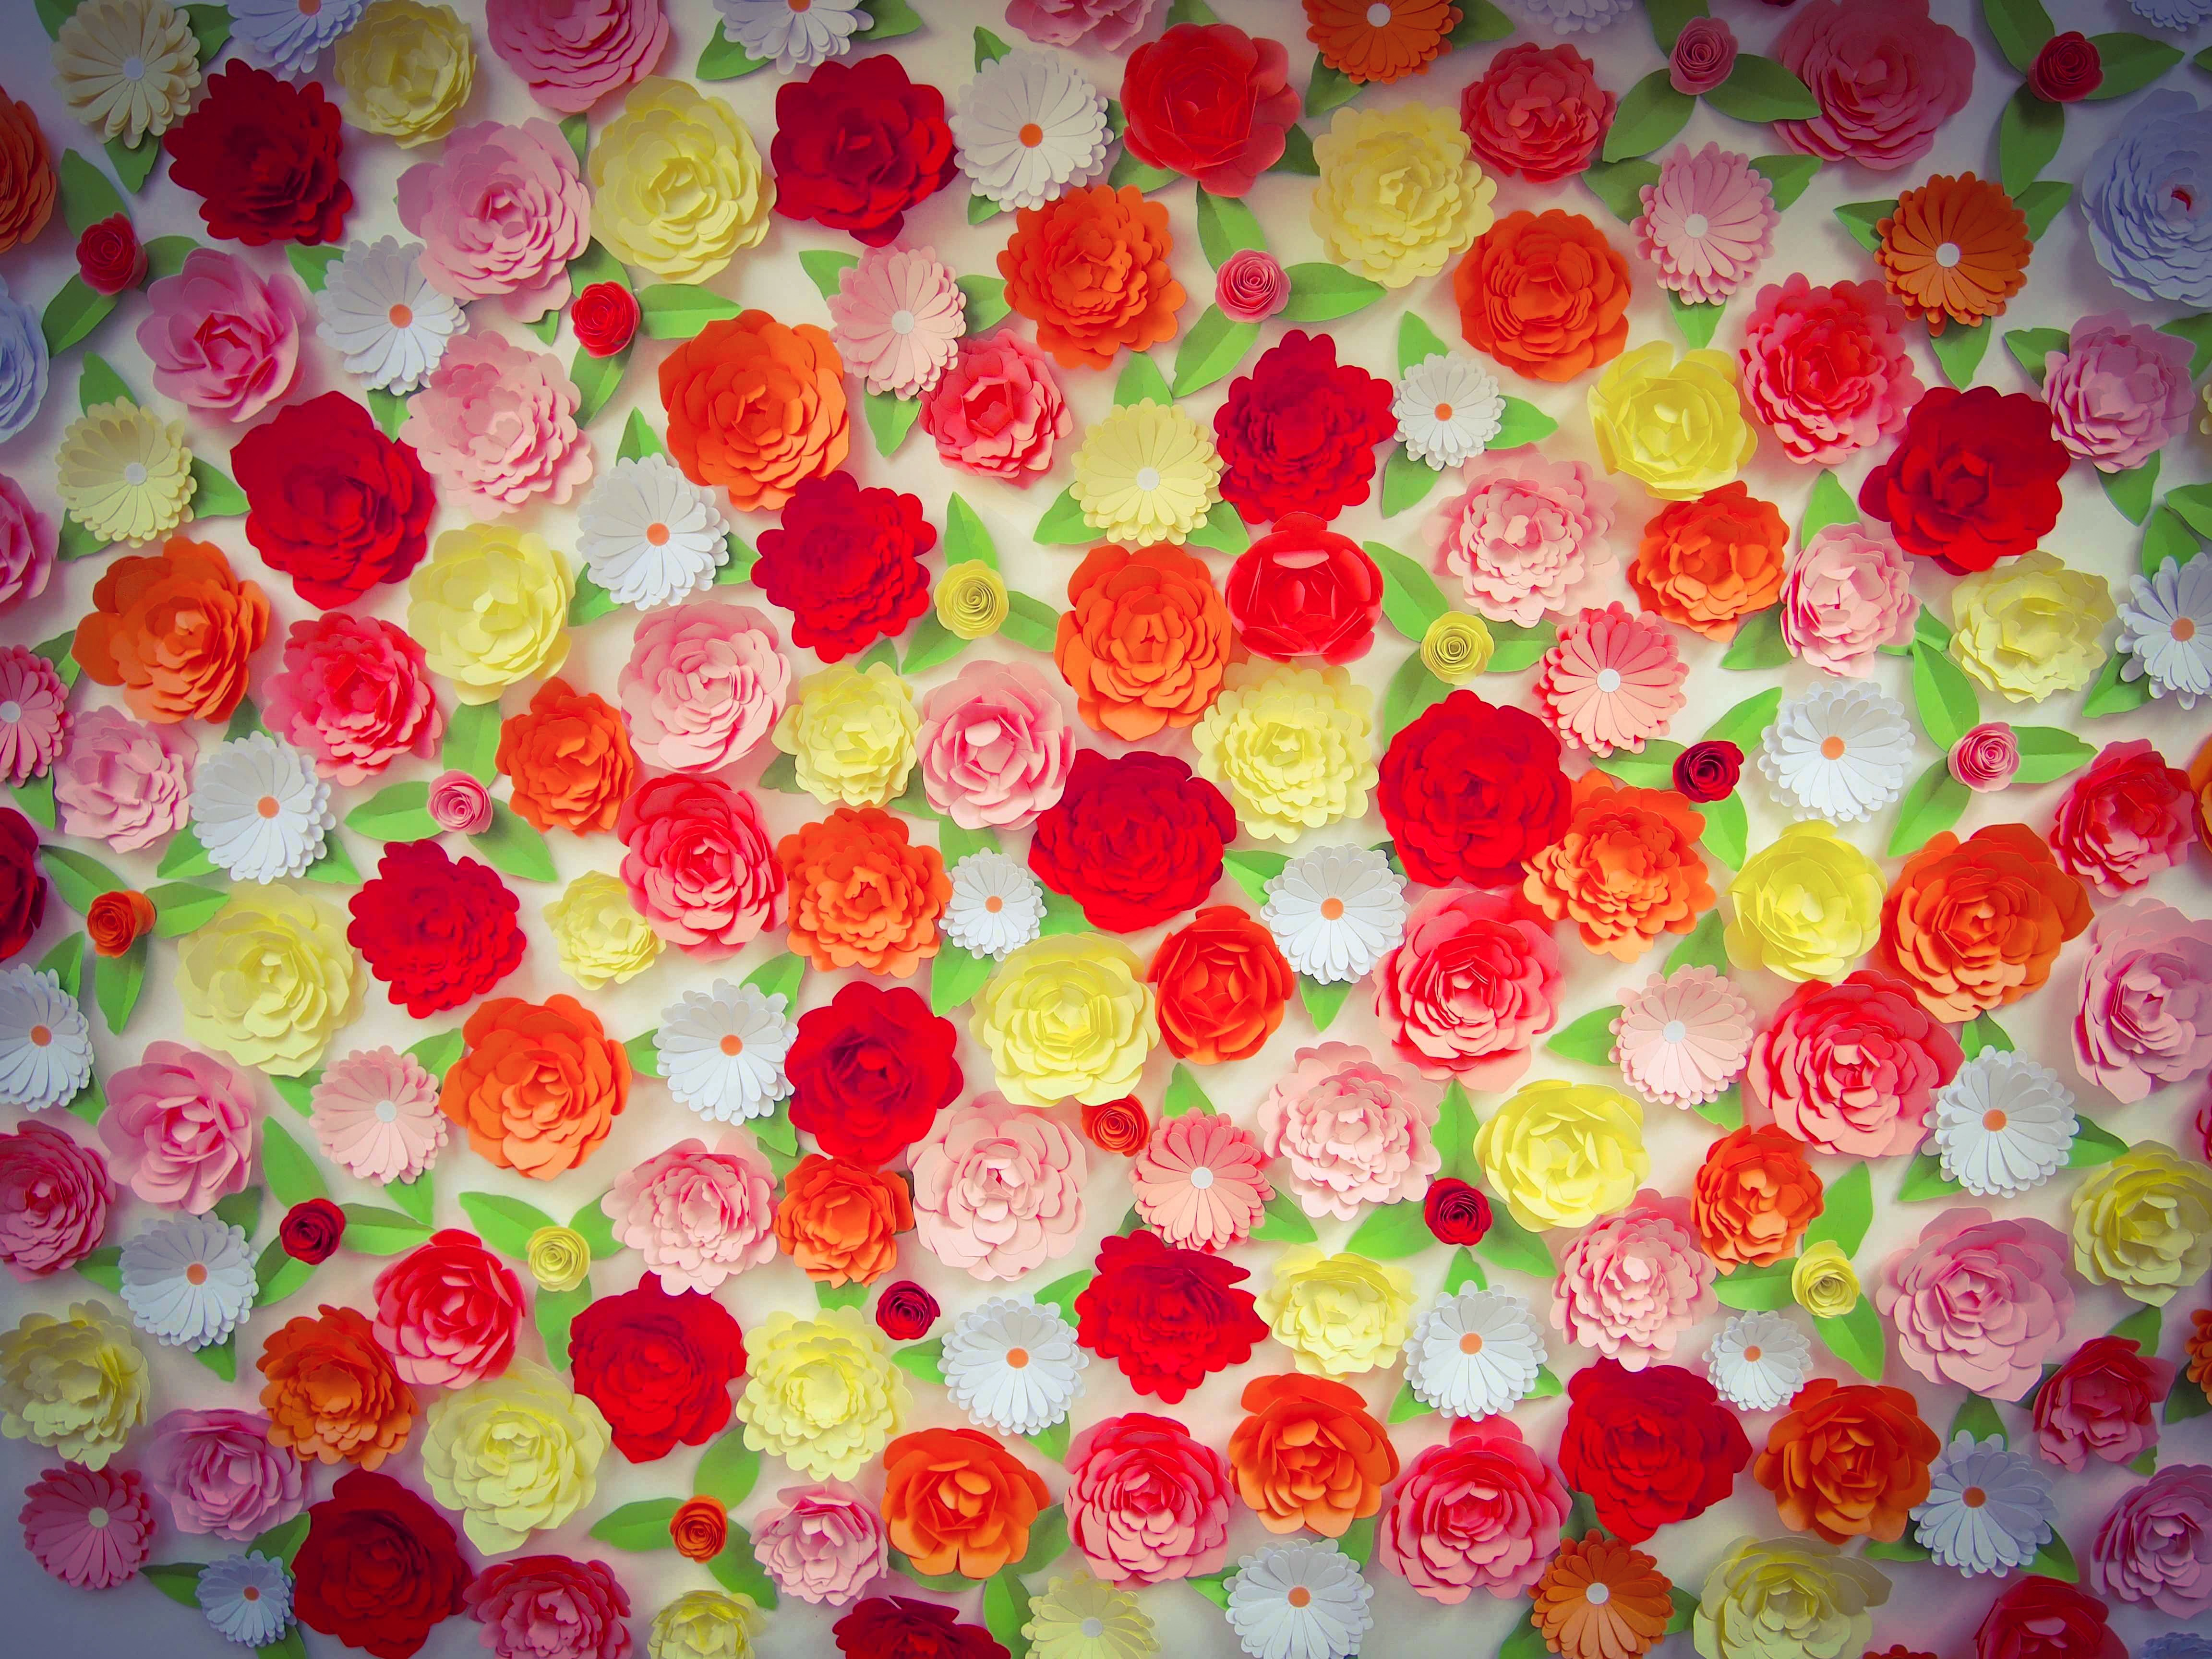 Décor mural & DIY - Rose Caramelle - Carnet d'inspiration